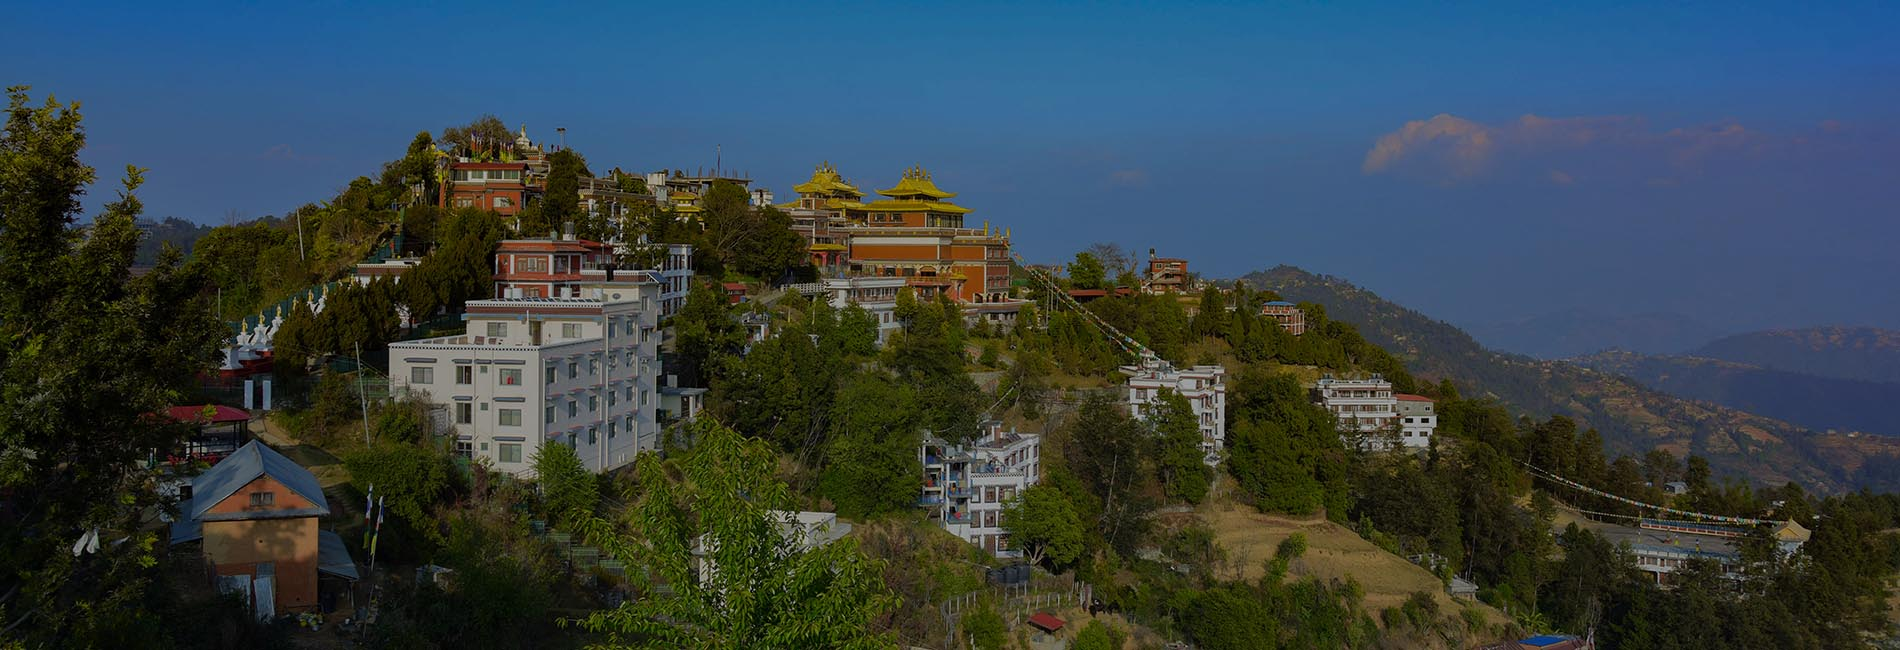 Namo Buddha_ An amazing Buddhist religious site in Nepal